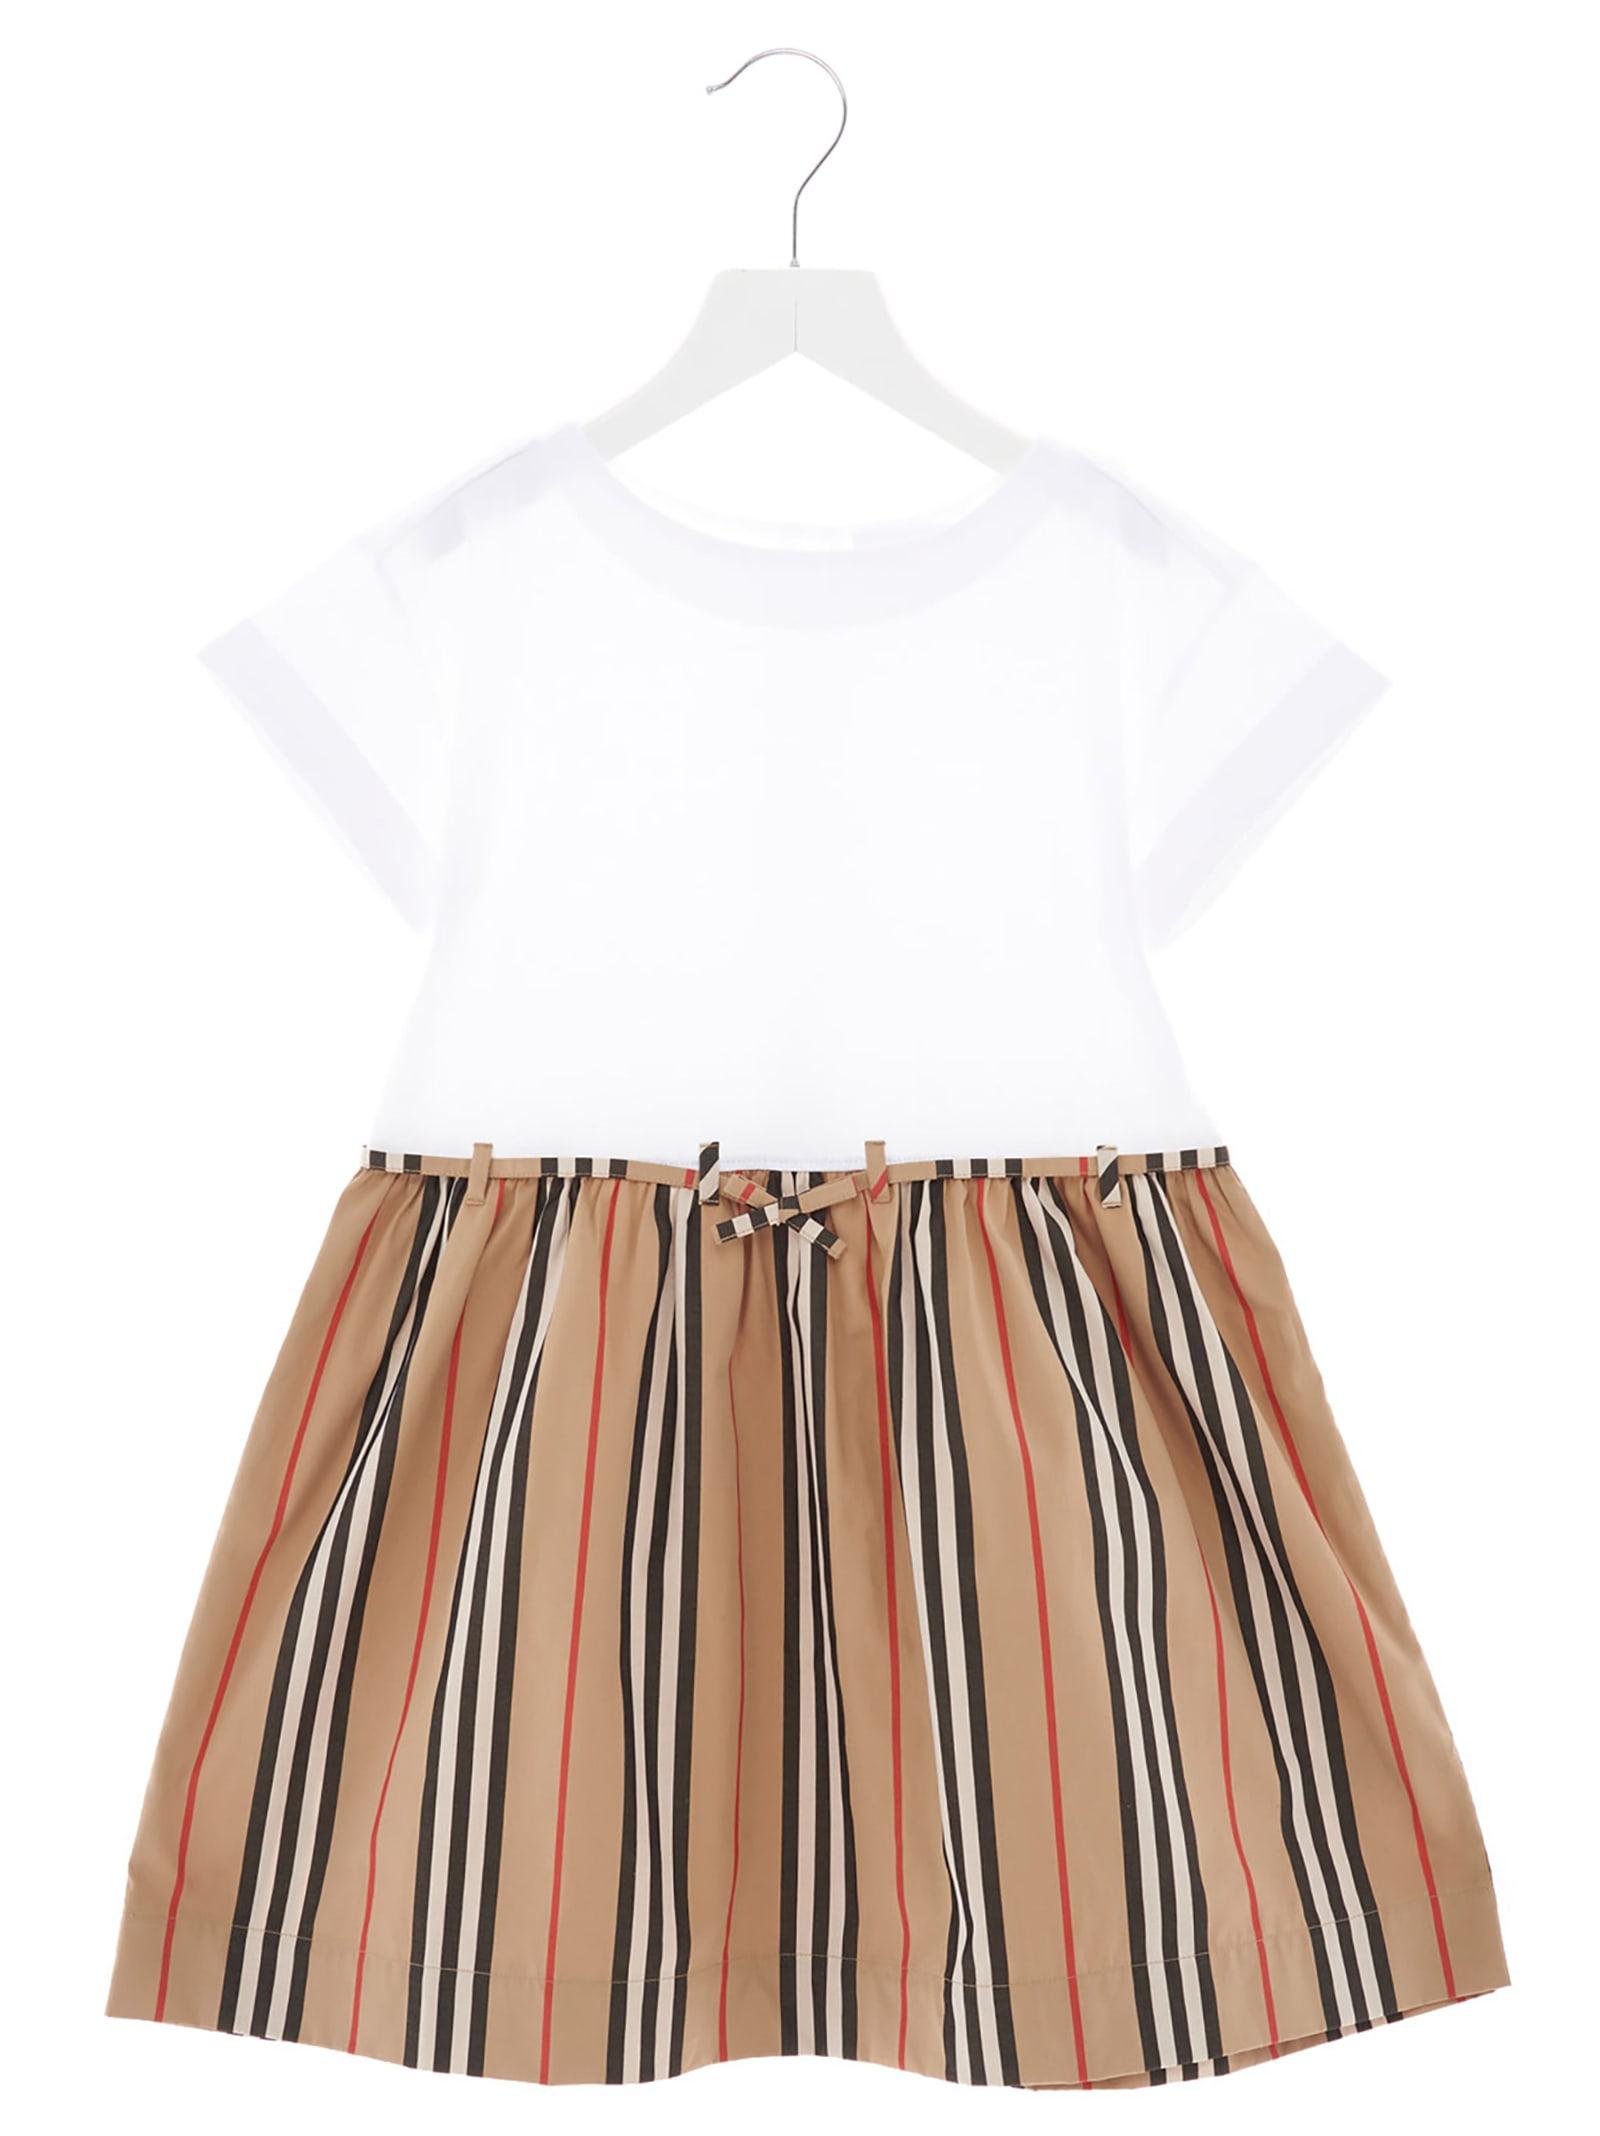 Burberry rhonda Dress